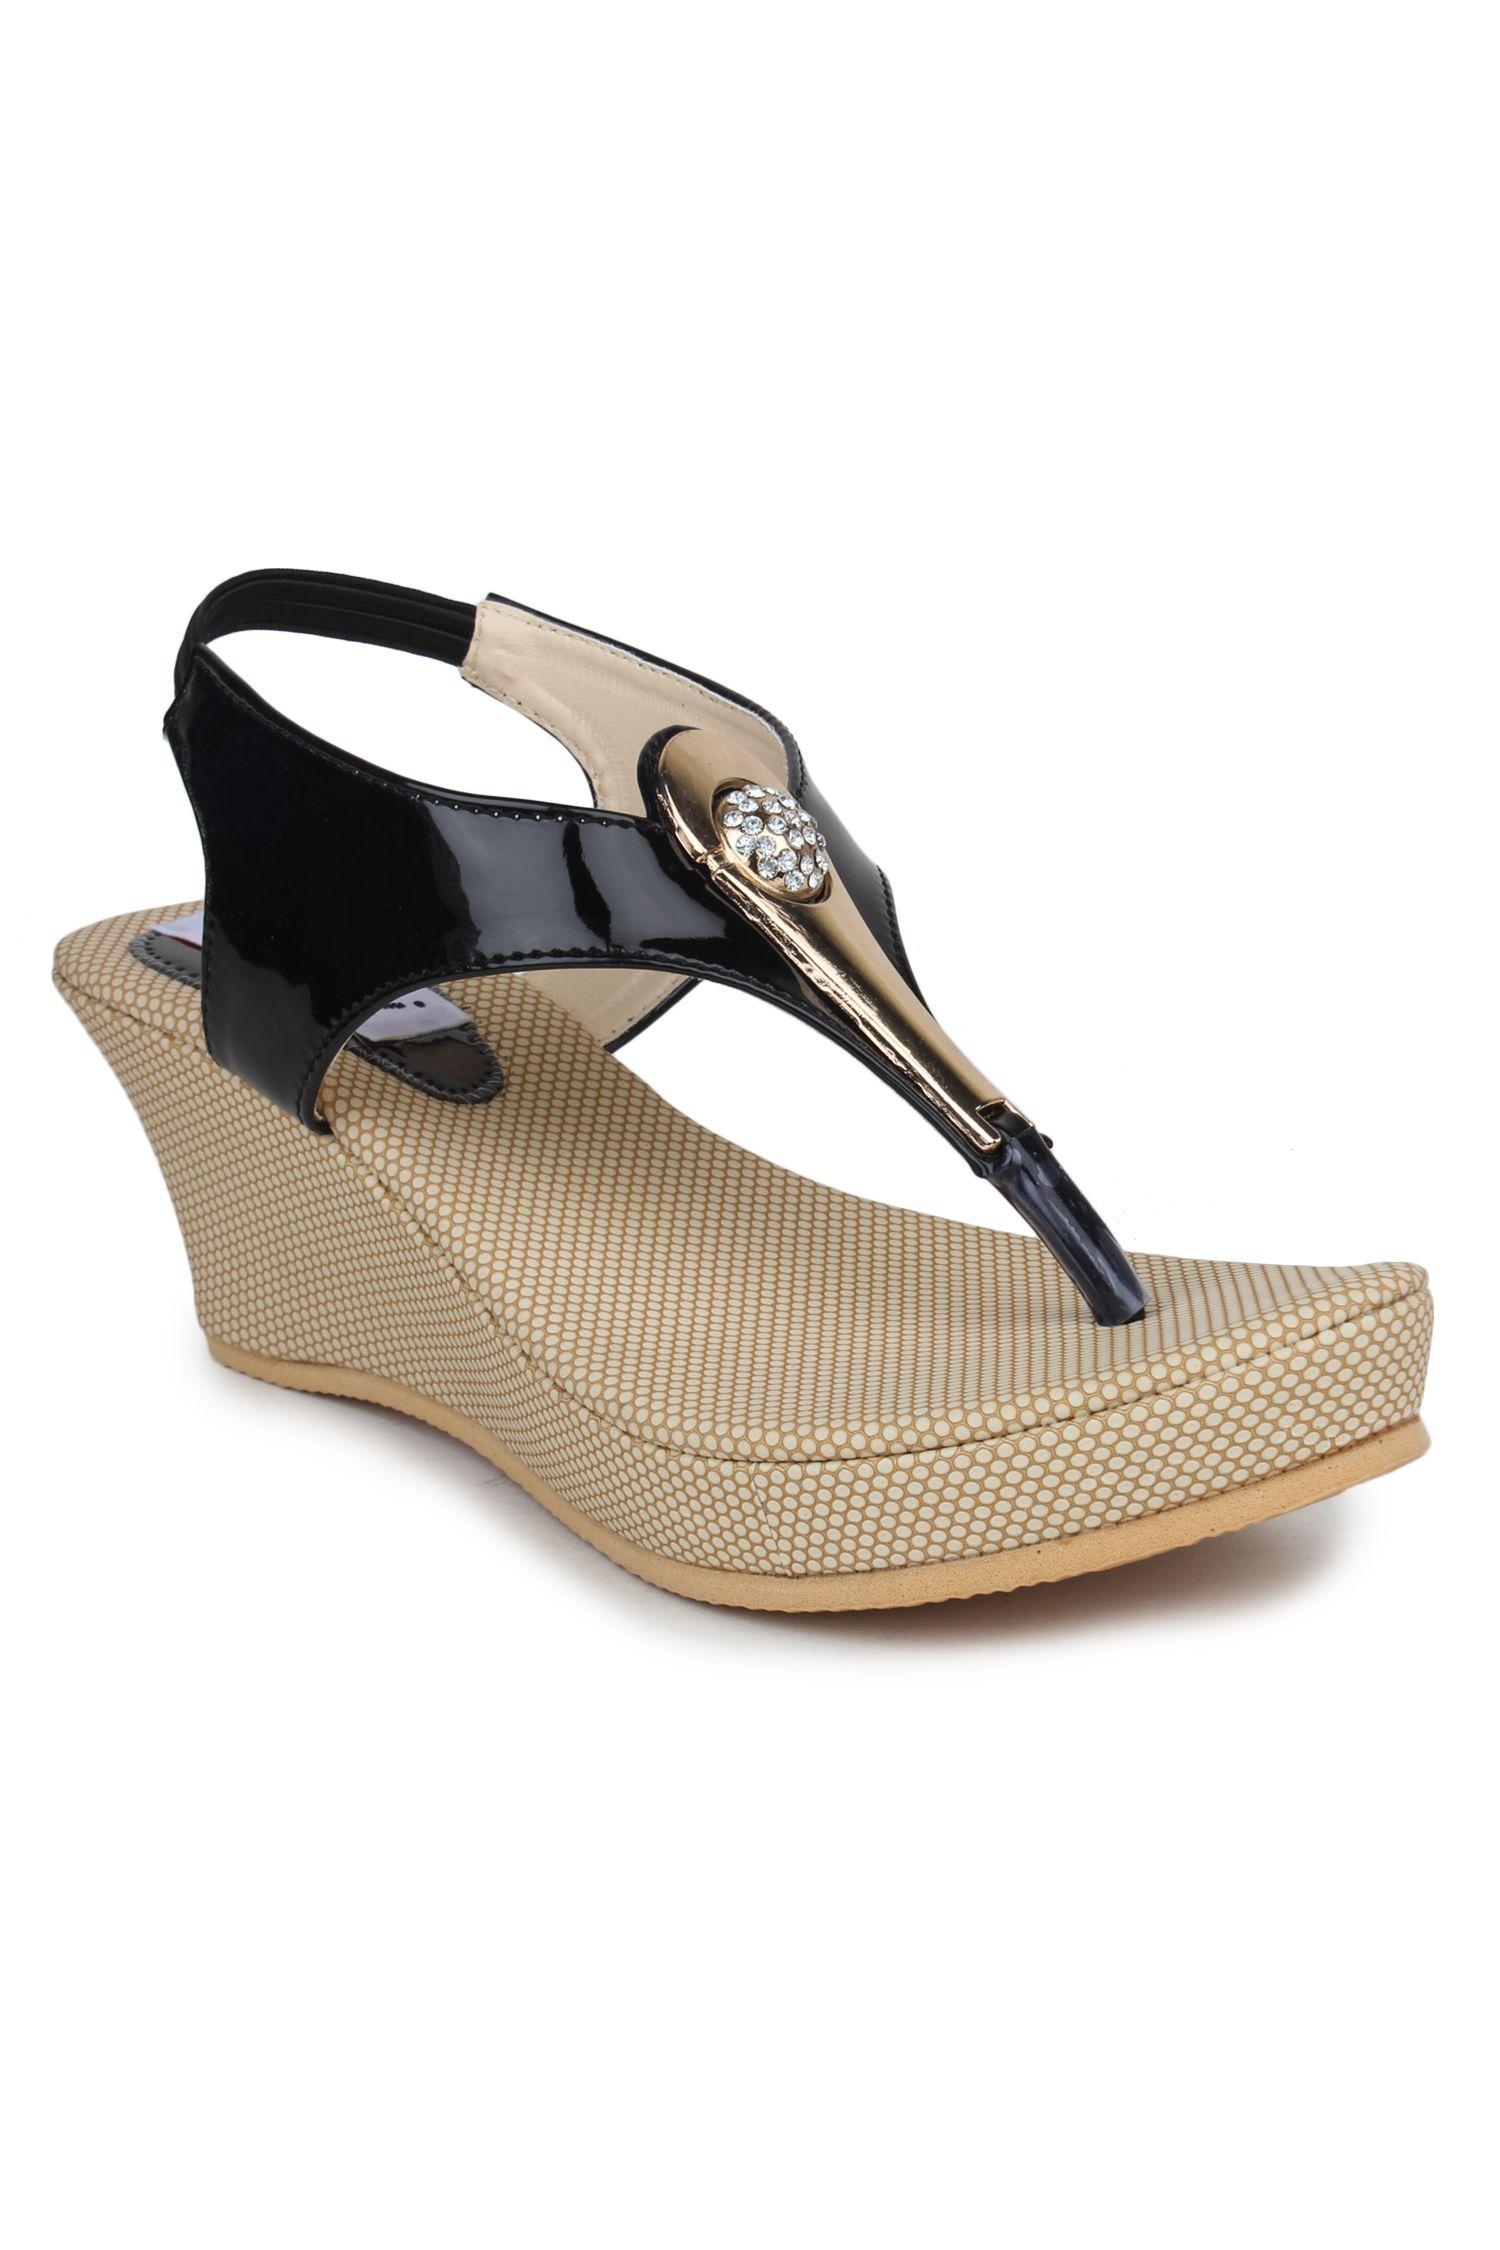 DIGNI White Wedges Heels